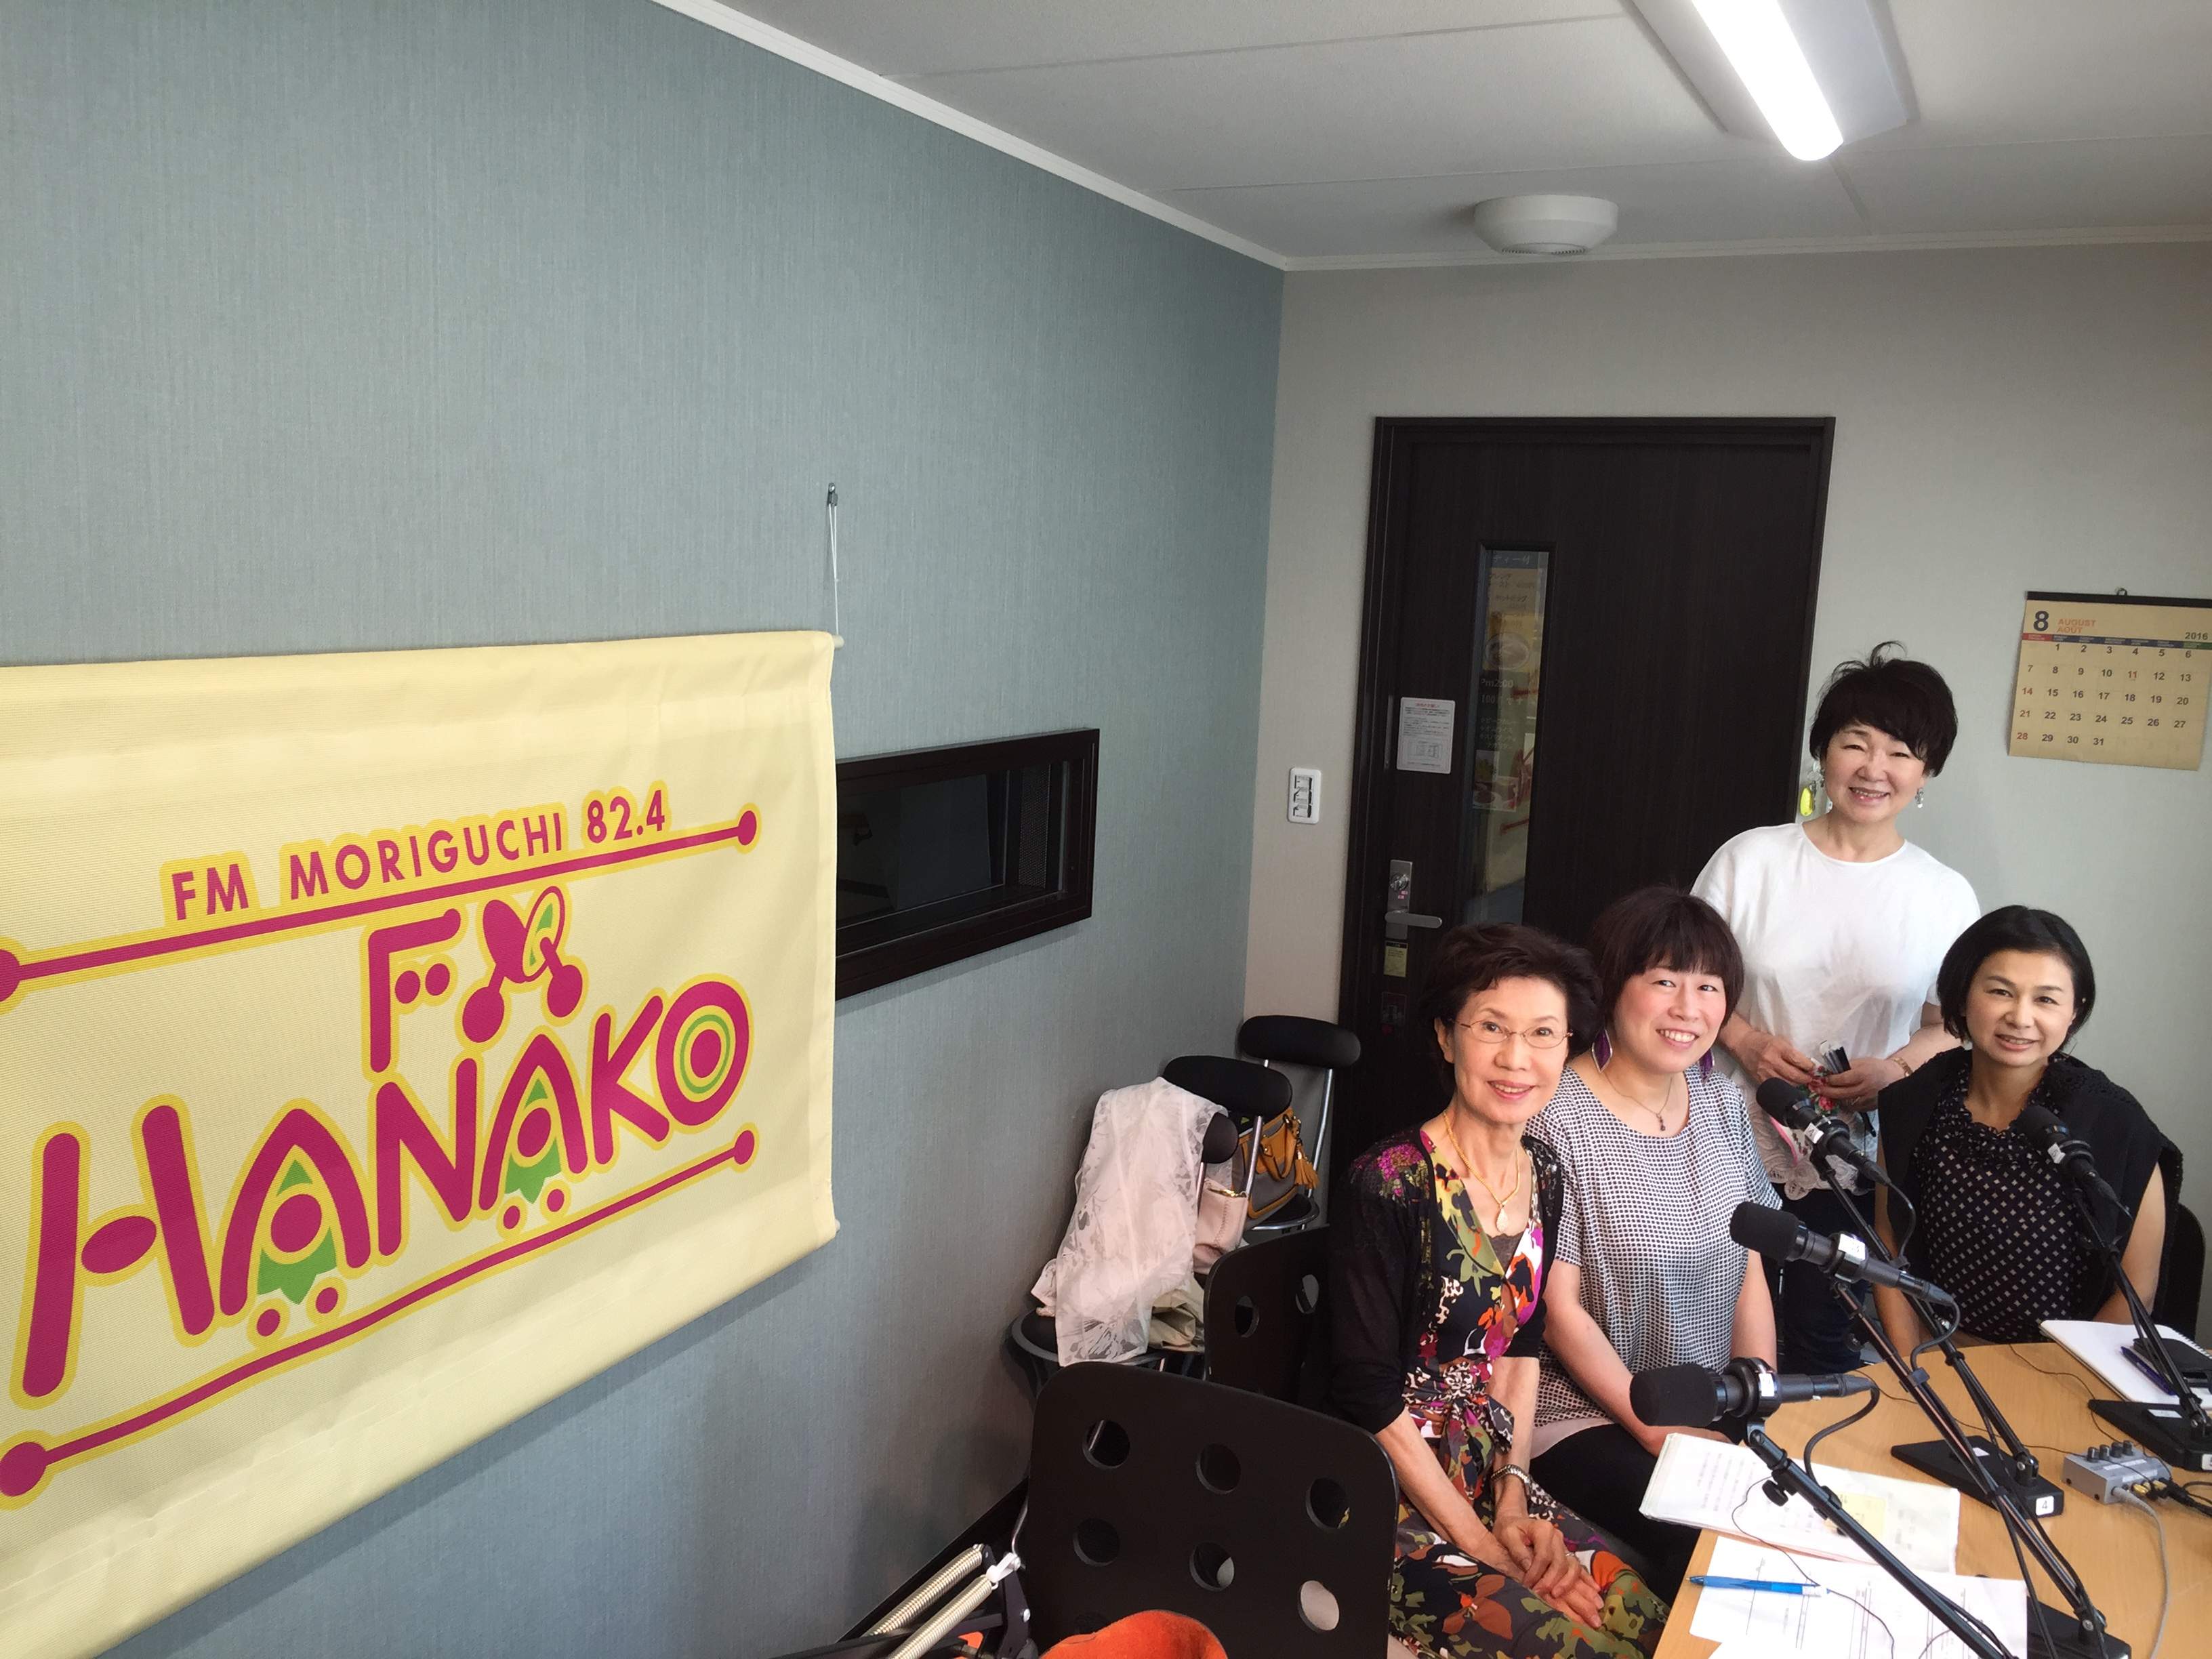 2/16 FM-hanako 出演します!